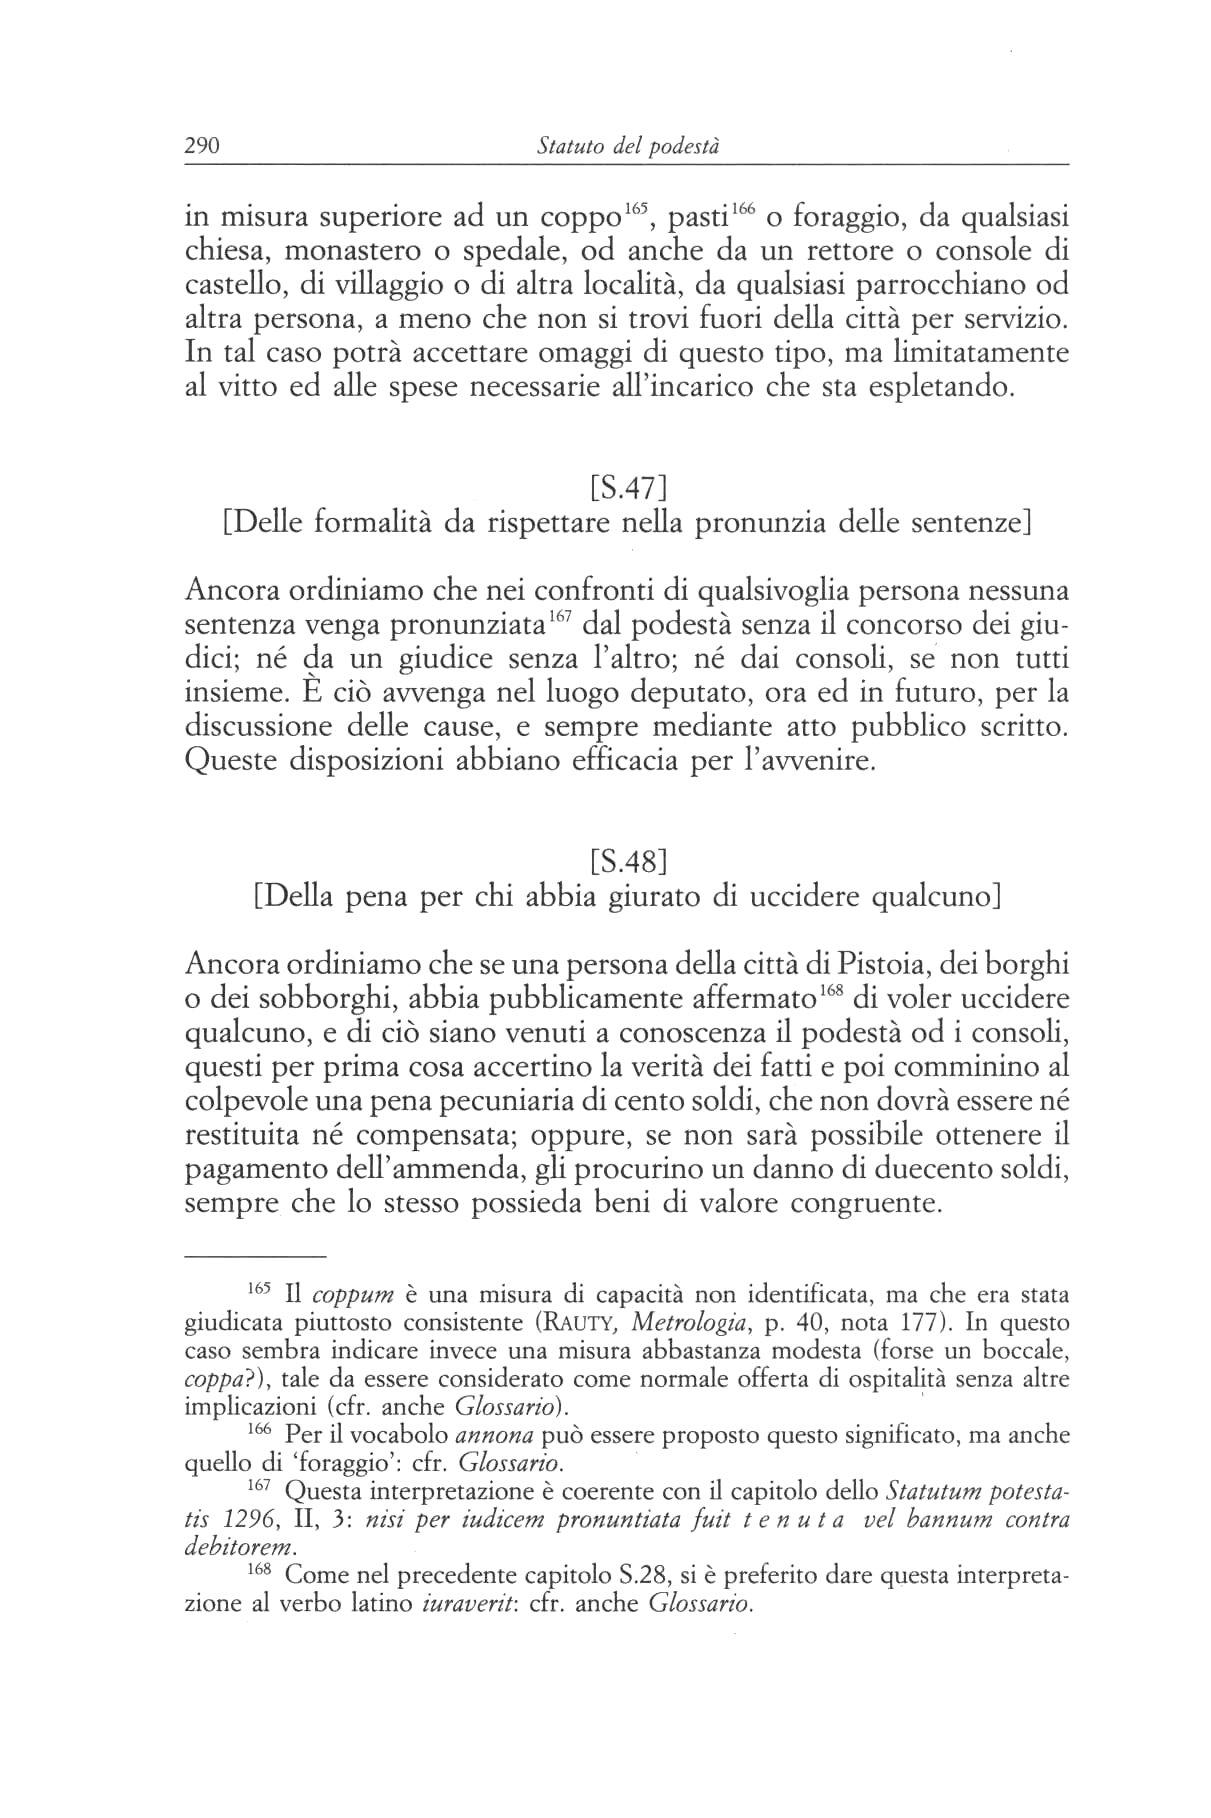 statuti pistoiesi del sec.XII 0290.jpg